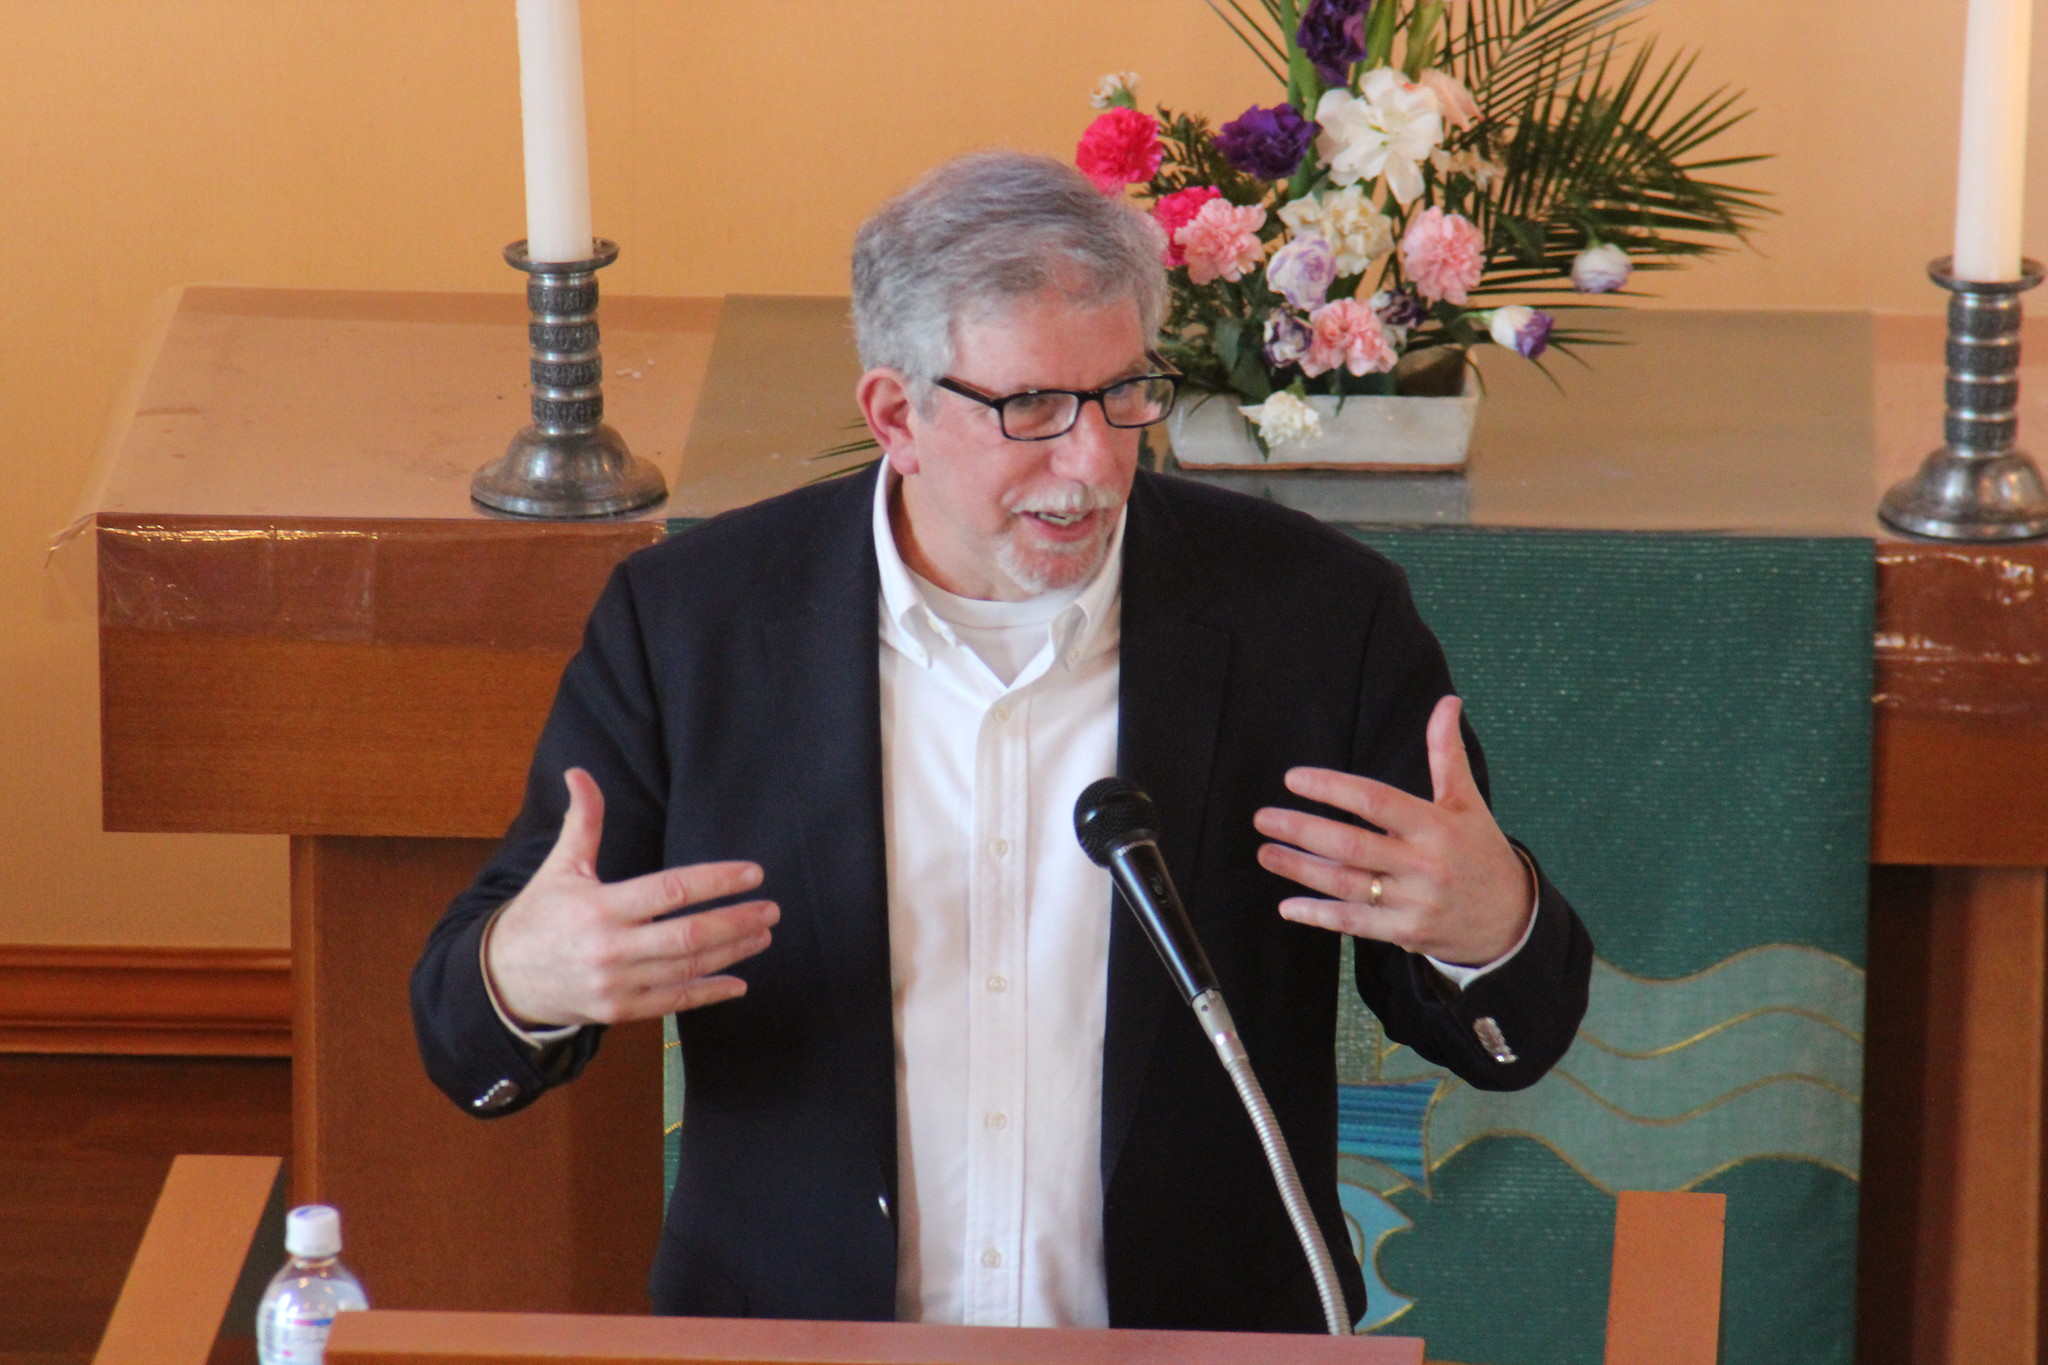 Bob teaching about evangelism